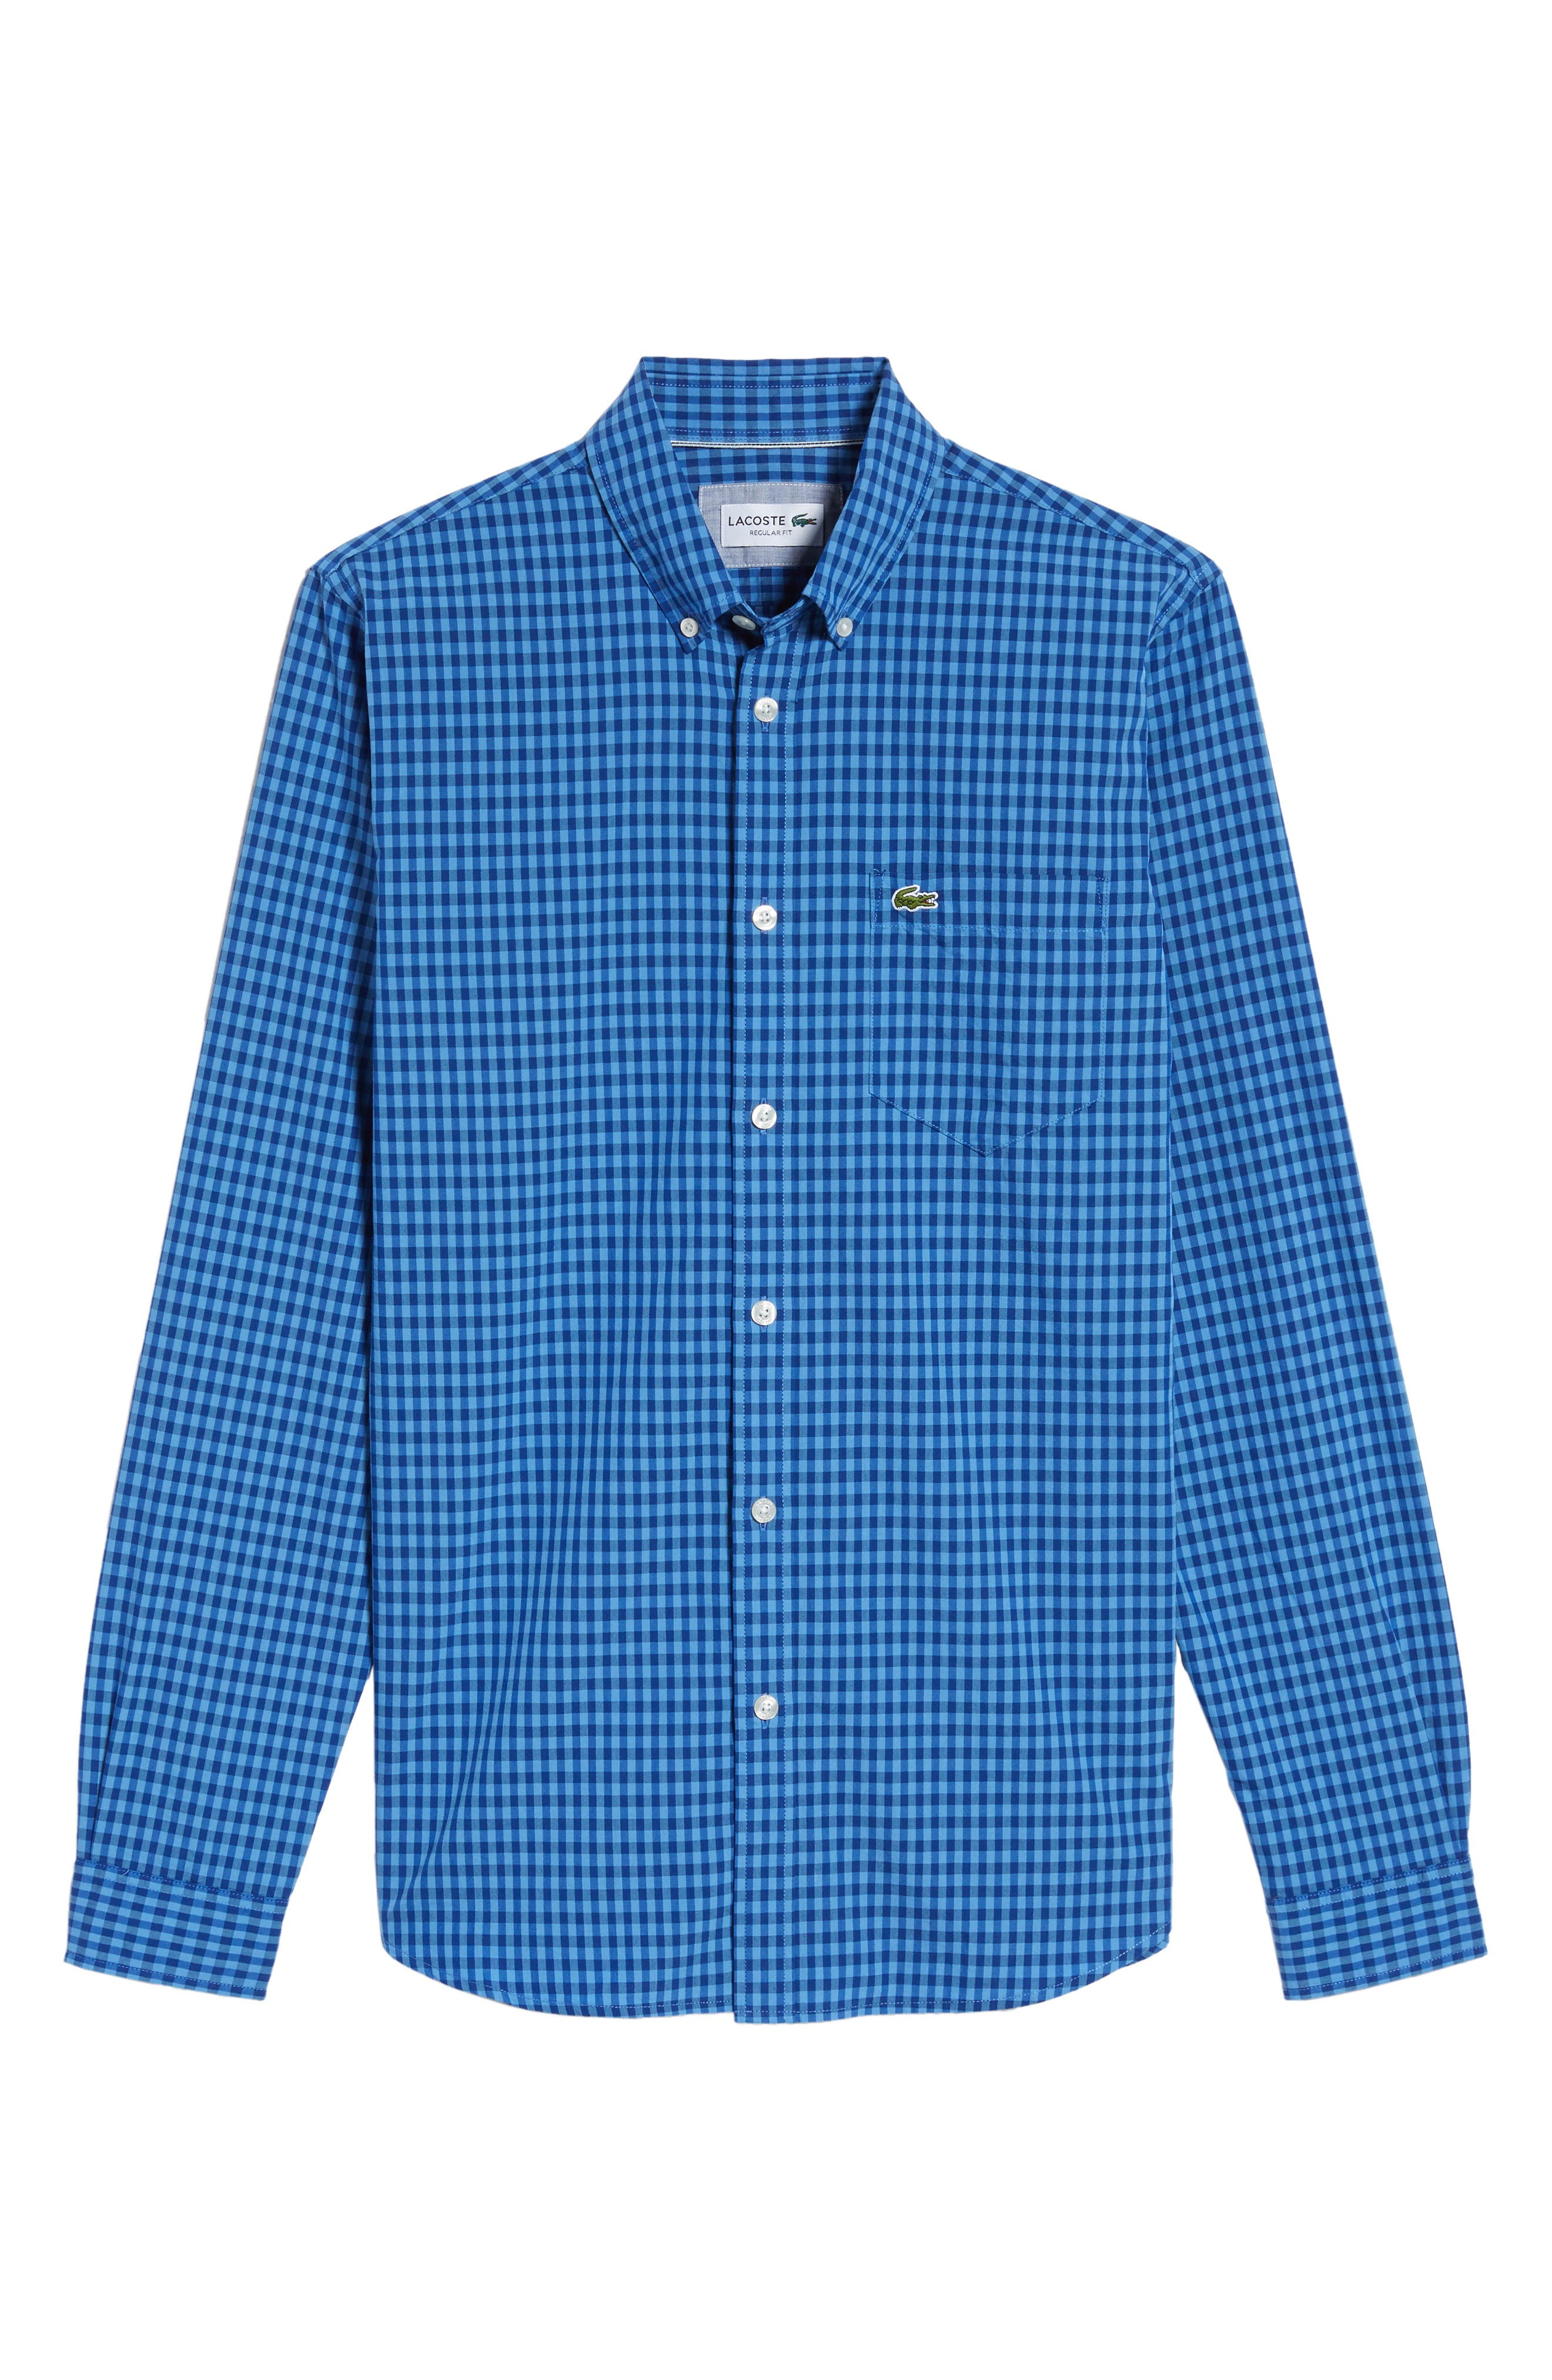 Gingham Check Poplin Shirt,                             Alternate thumbnail 6, color,                             493